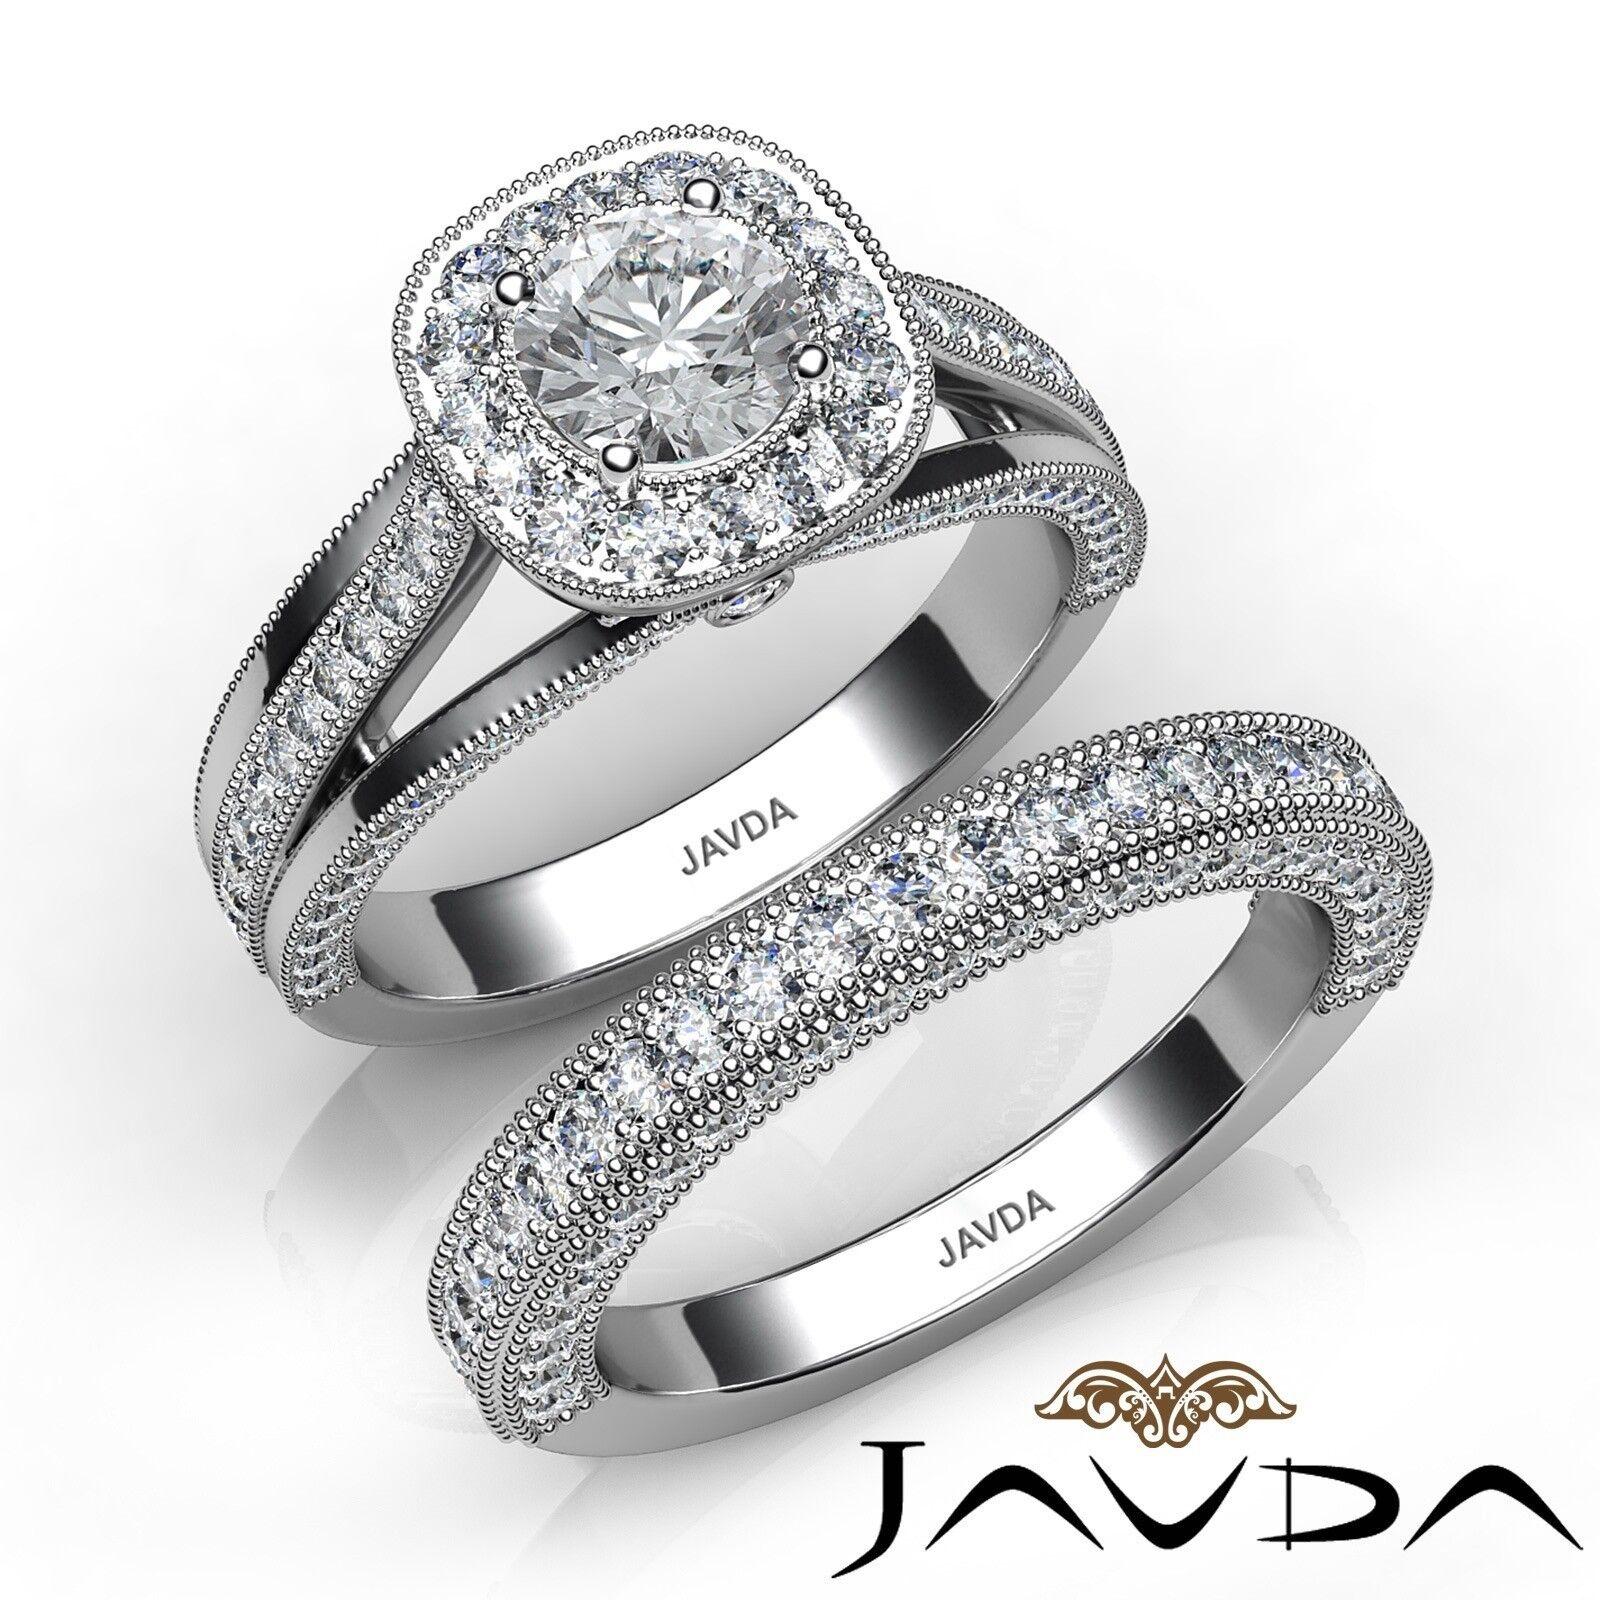 2.1ct Milgrain Bridal Set Halo Pave Round Diamond Engagement Ring GIA F-VS1 Gold